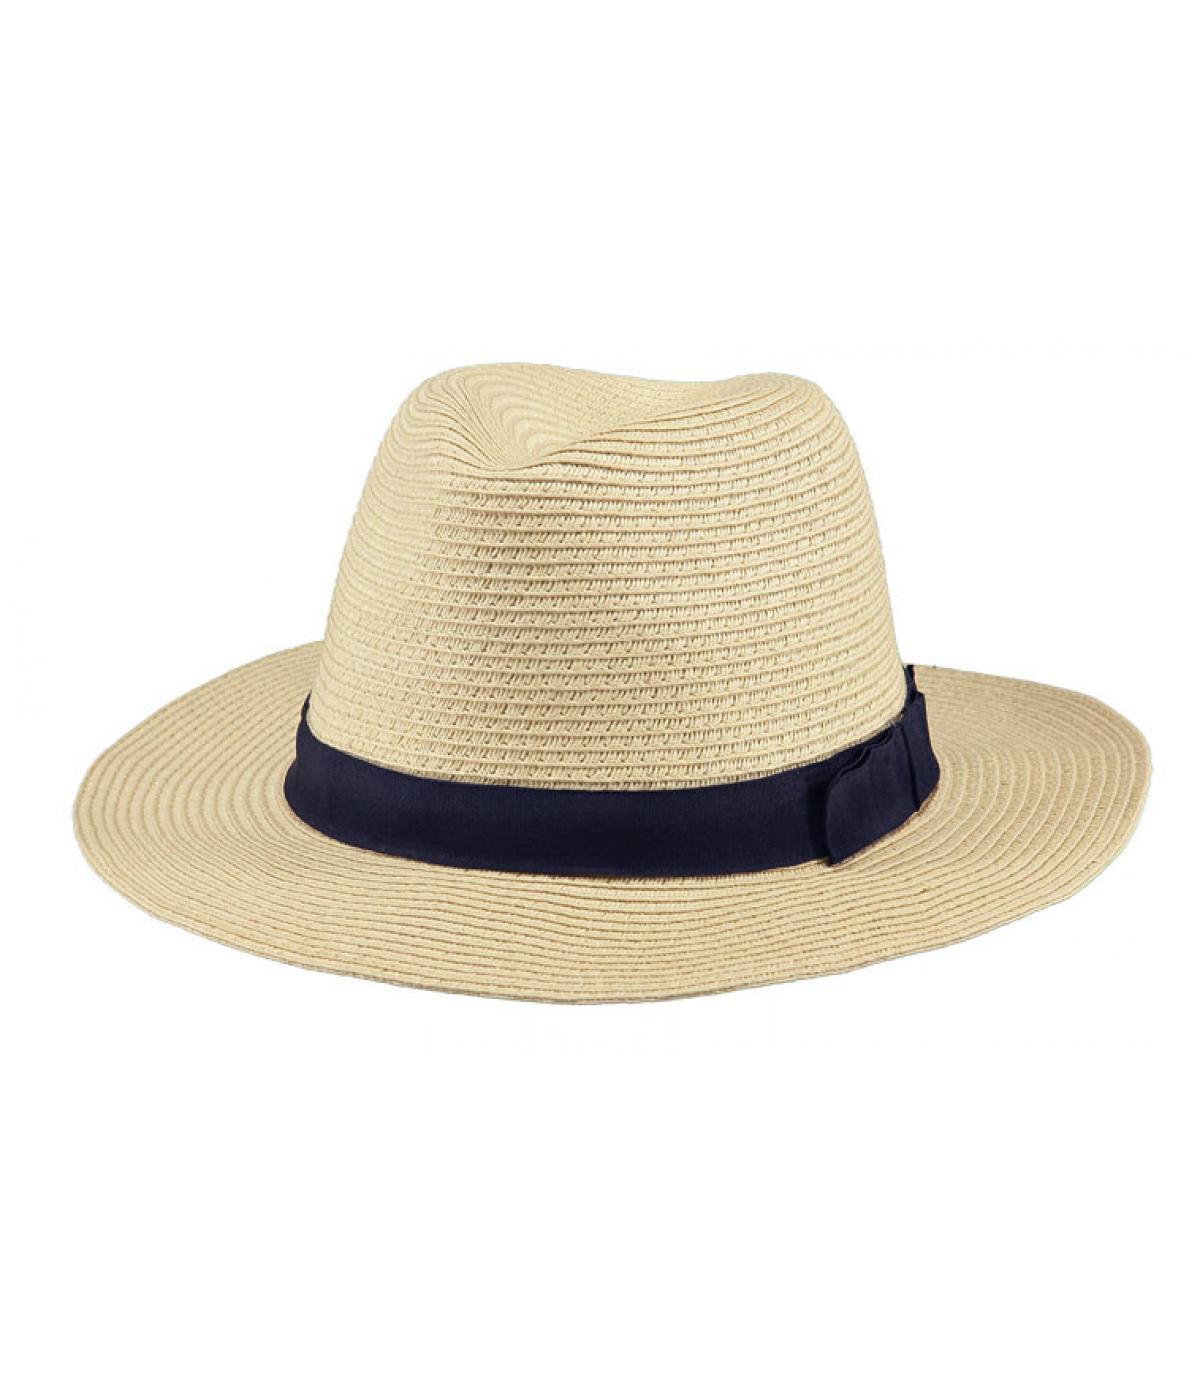 Chapeau paille beige ruban bleu